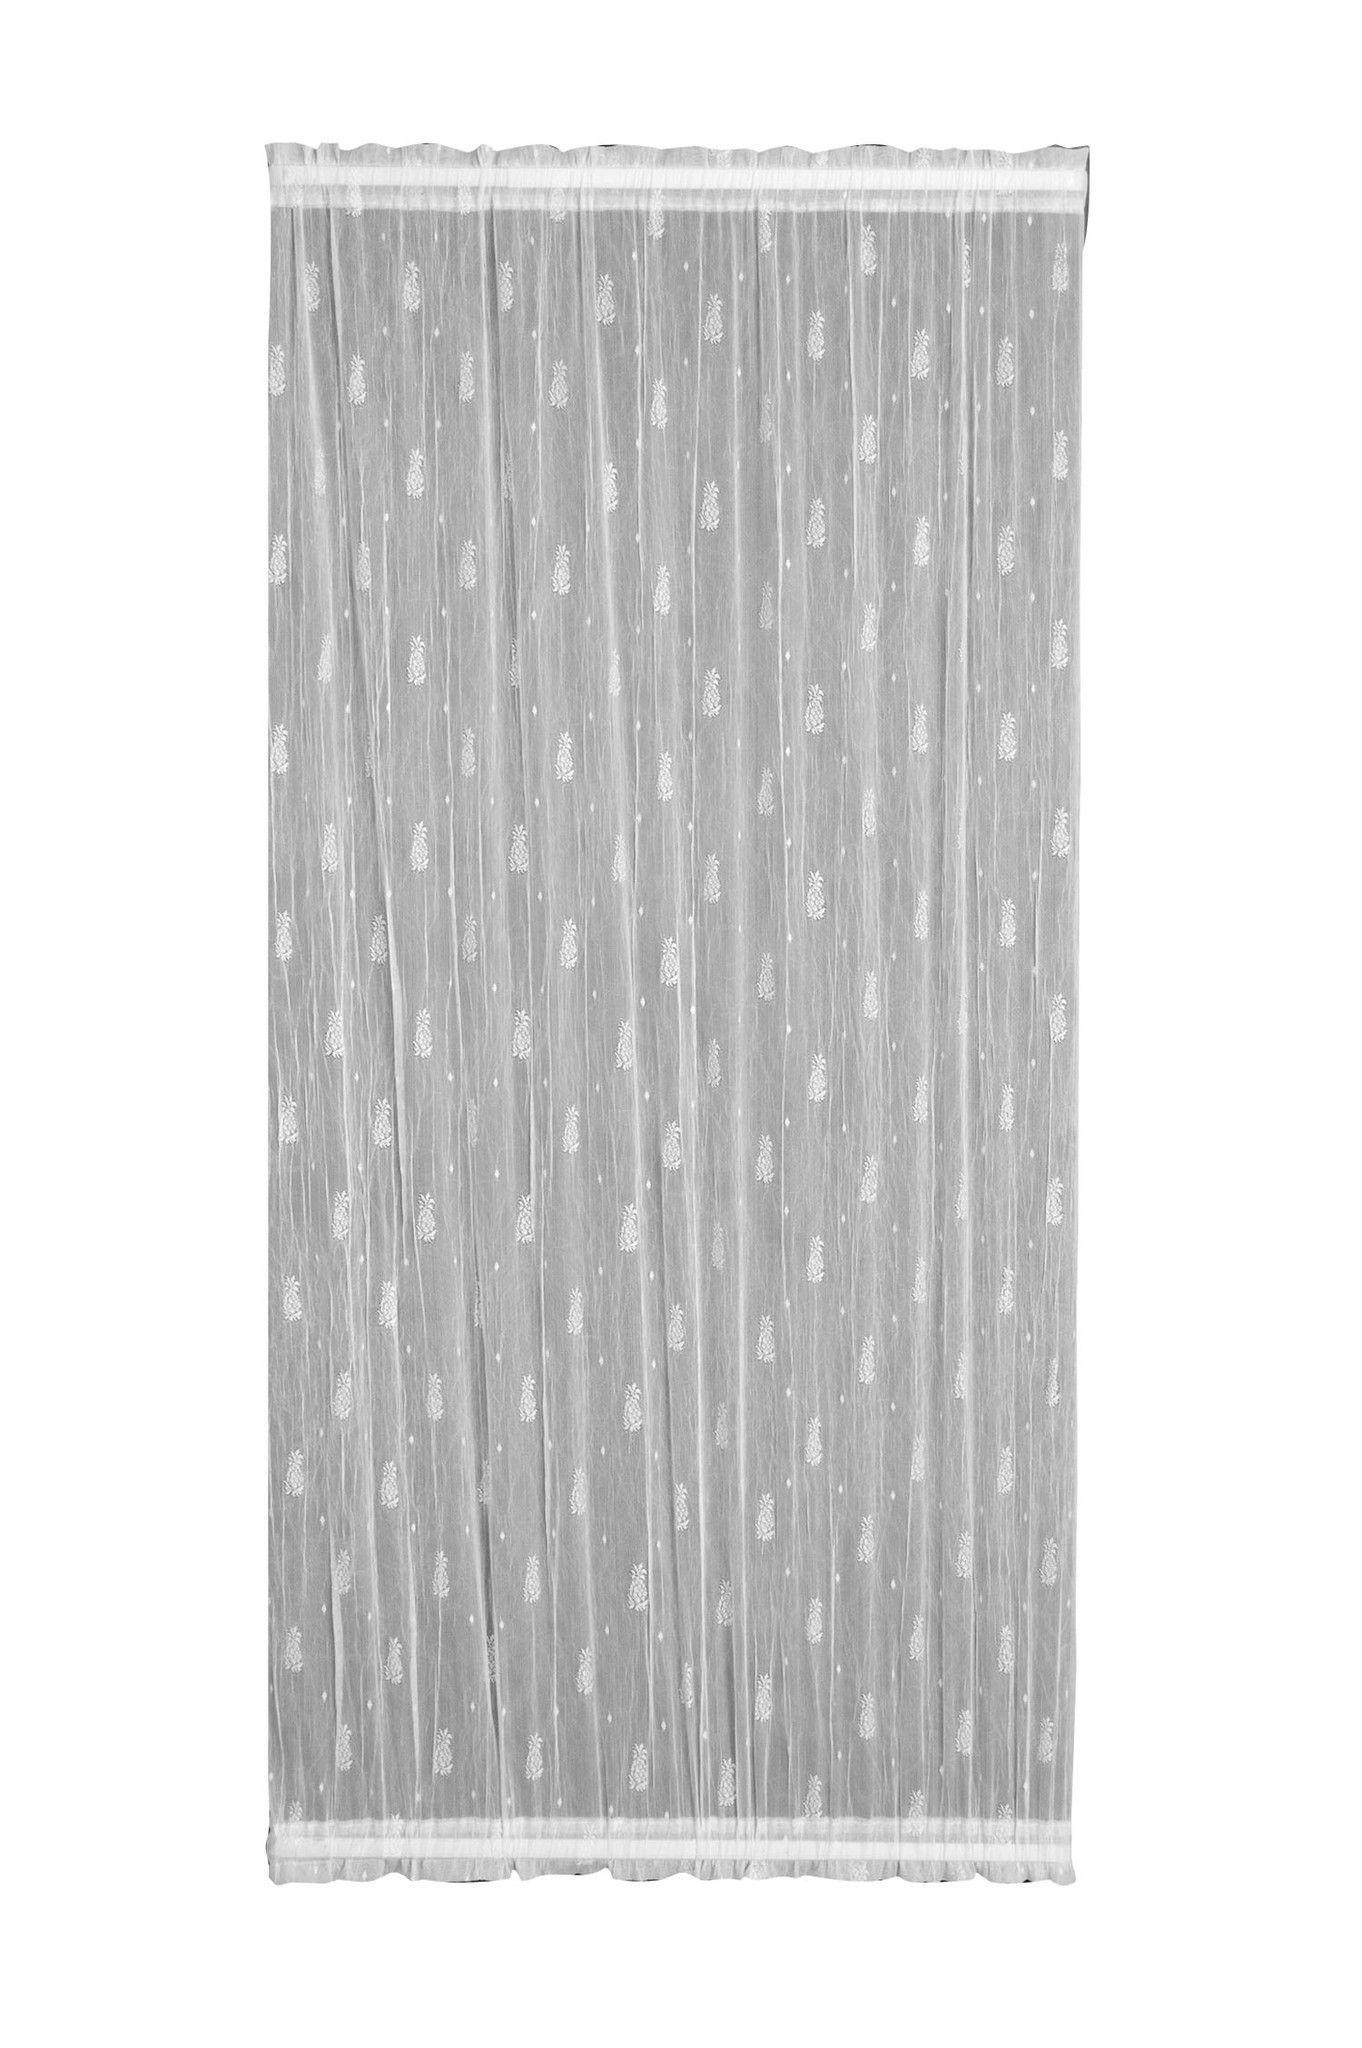 Pineapple 45X72 Door Panel, White